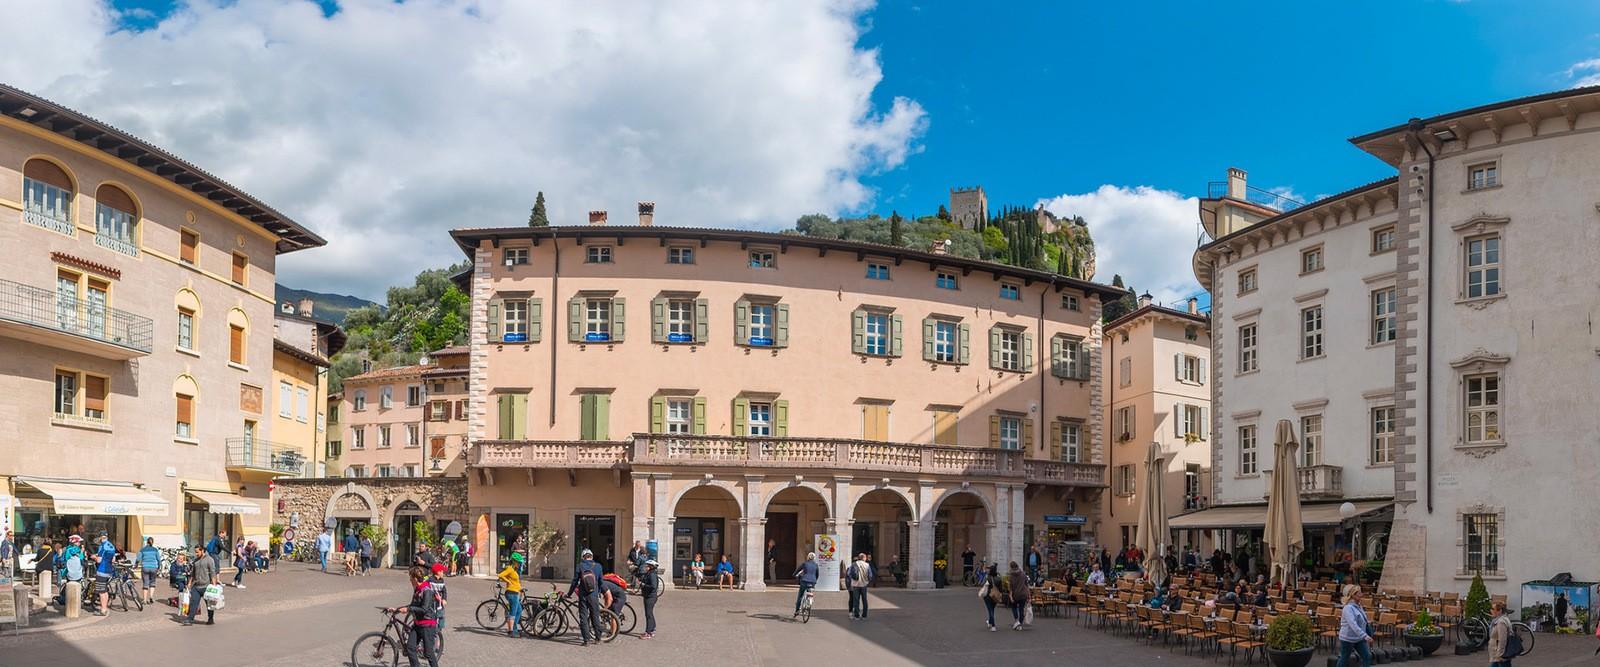 Trentino-Arco